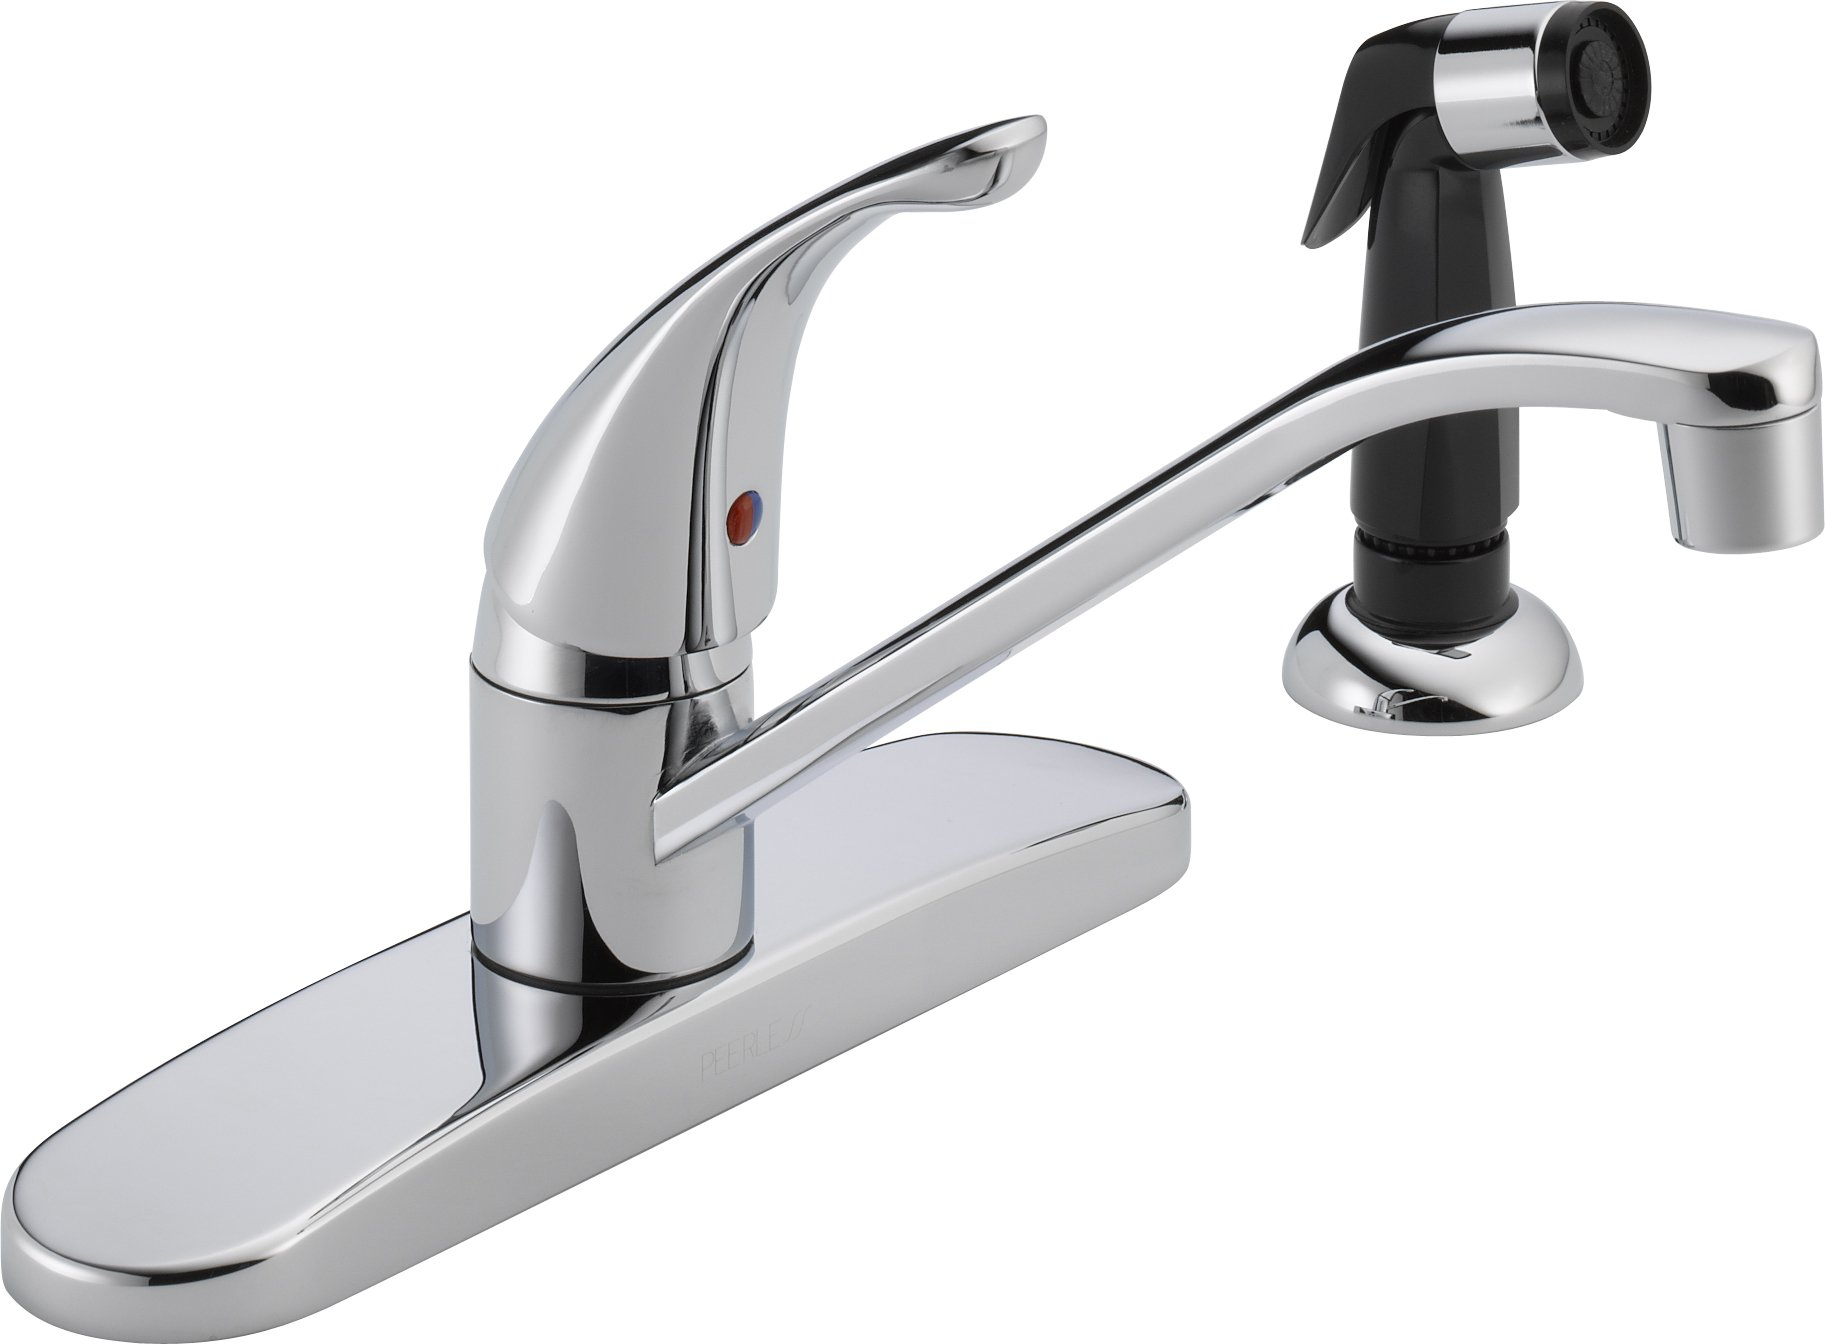 Peerless P115LF Classic Single Handle Kitchen Faucet, Chrome